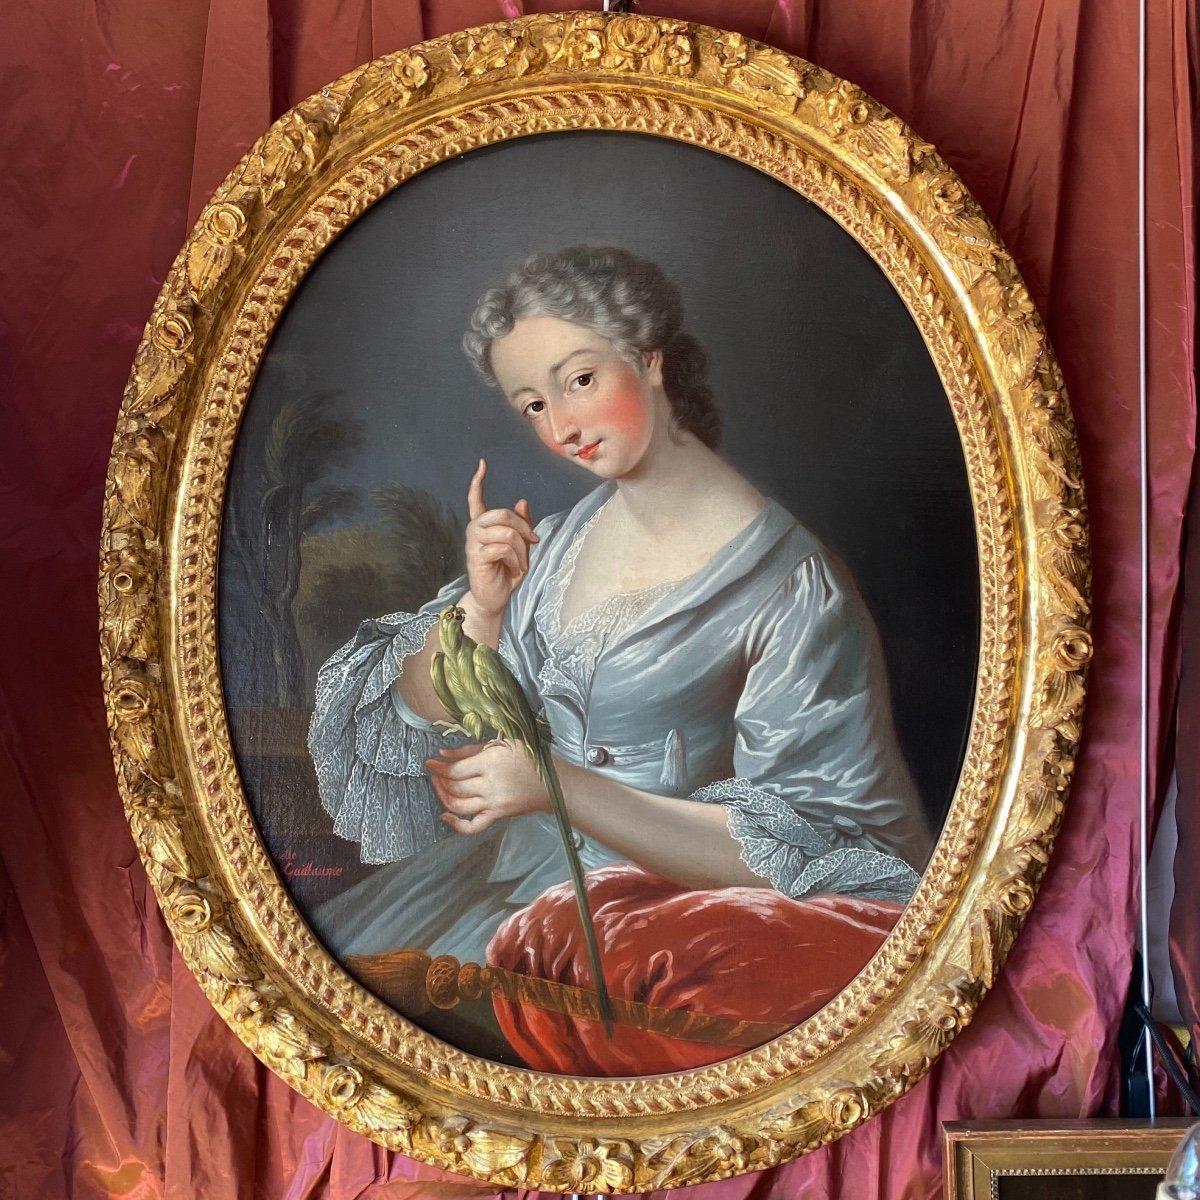 J-A Berthelot de Pléneuf, Marquise de Prie. Vers 1720. JB Van Loo (atelier)